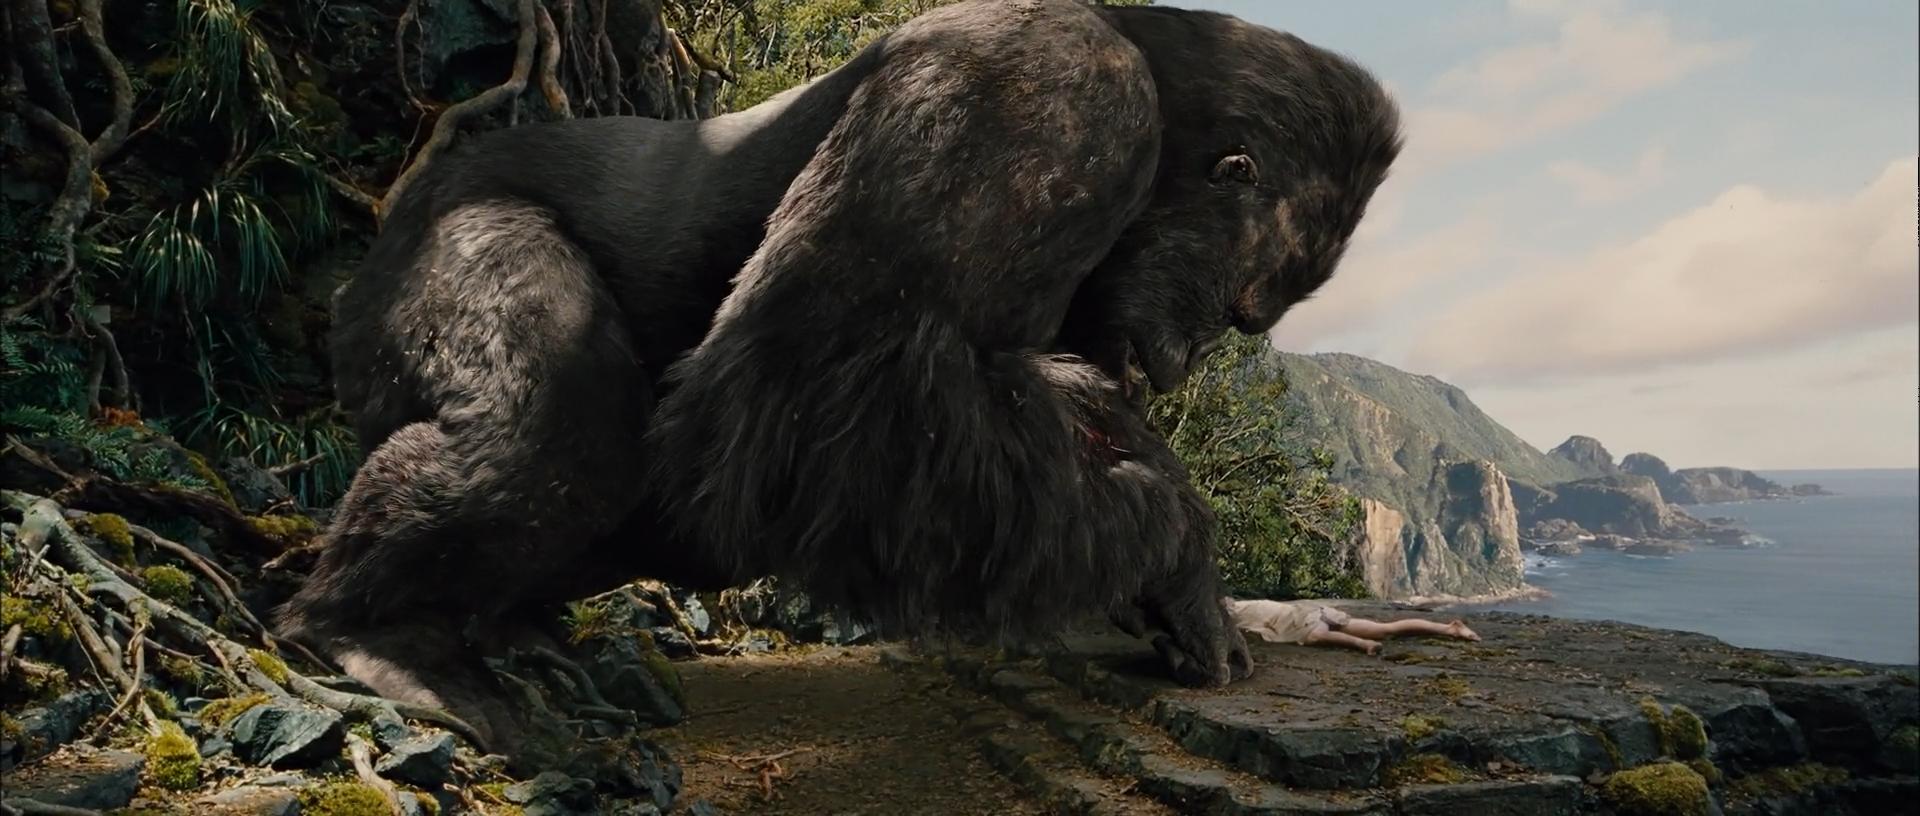 «Годзилла против Конга» (Godzilla vs. Kong)